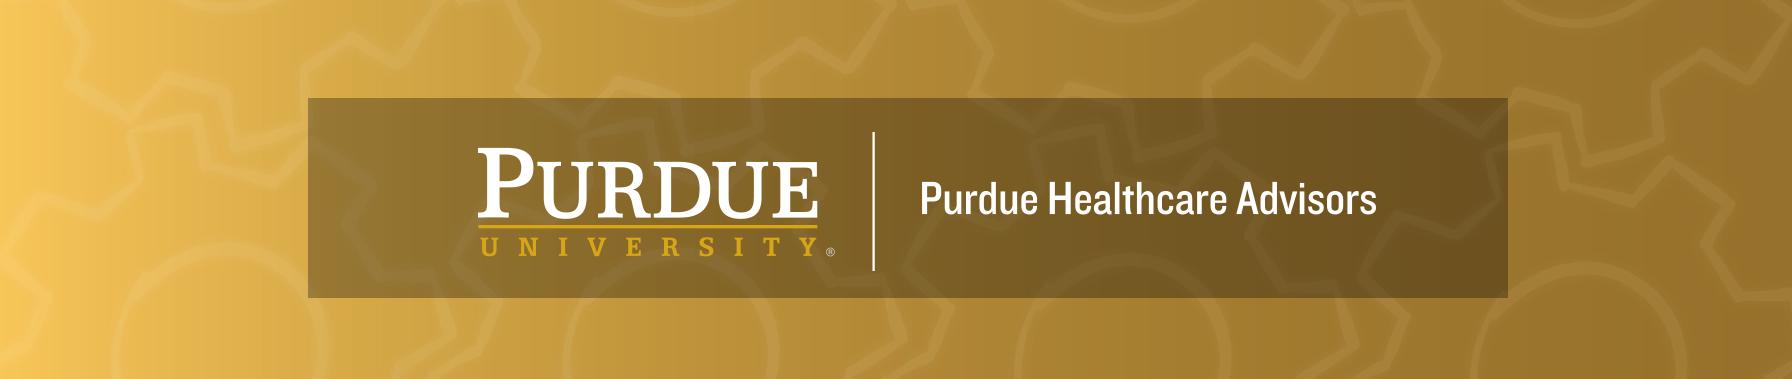 Purdue Healthcare Advisors